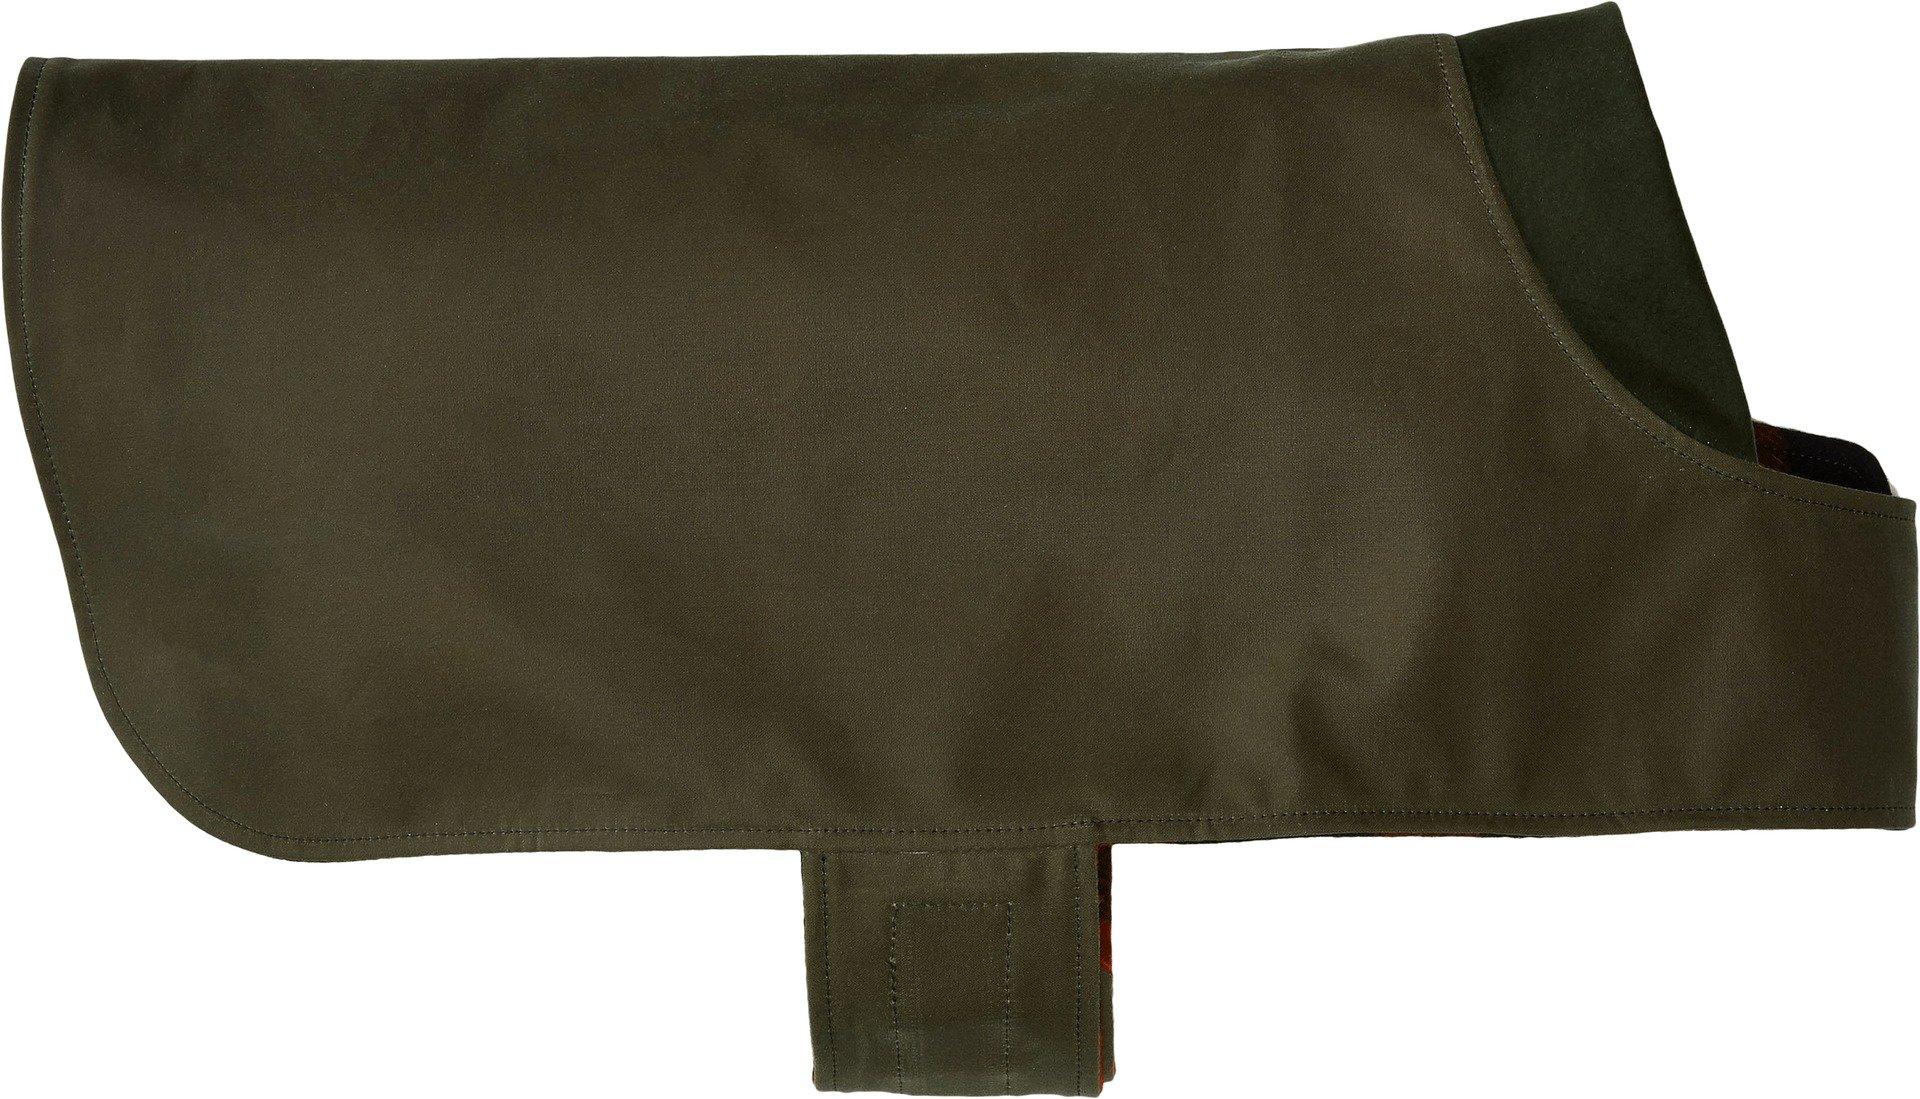 Shelter Dog Coat in Otter Green Size: Large (21'')